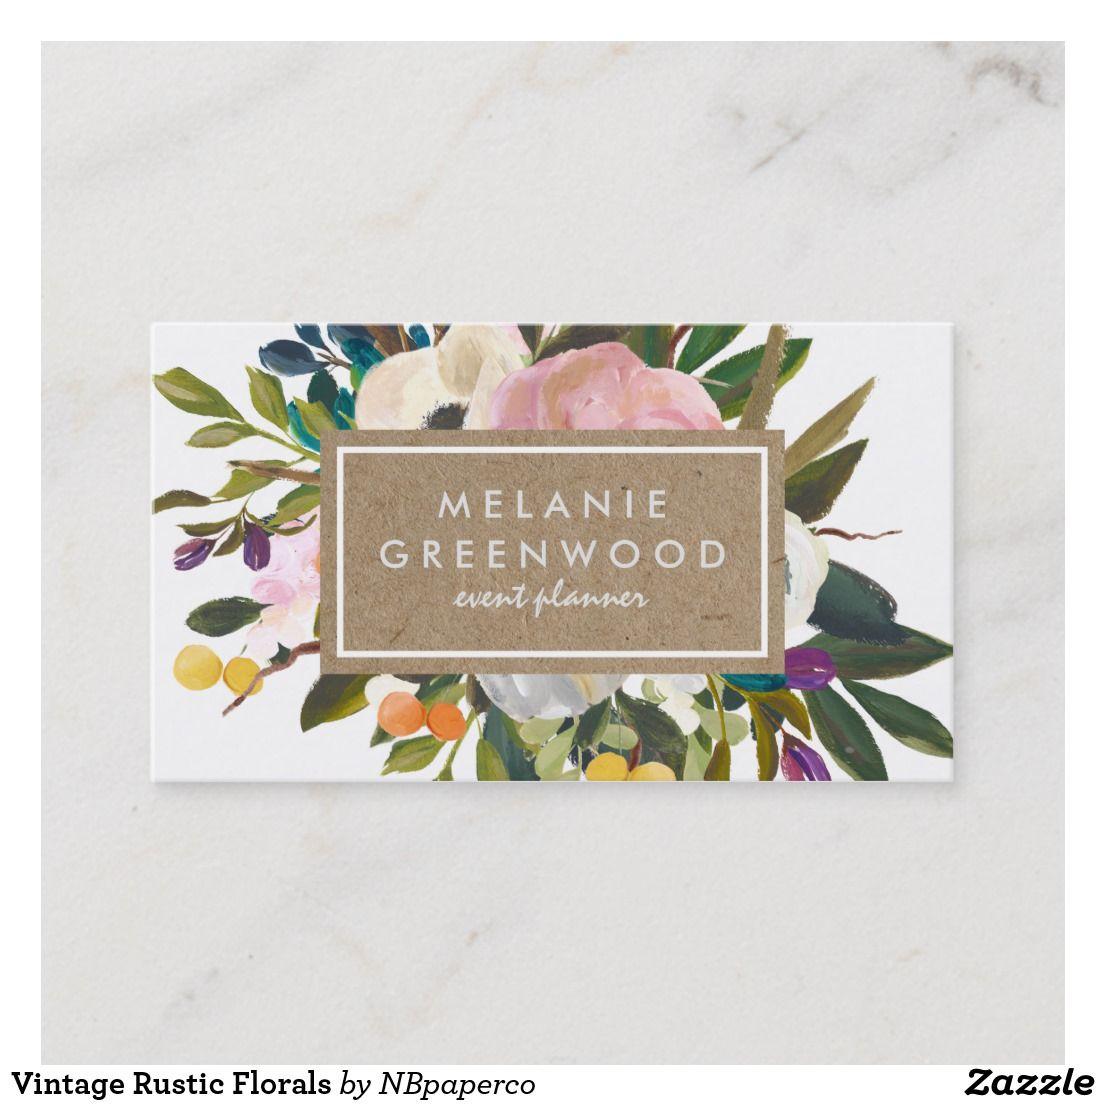 Vintage rustic florals business card business cards pinterest vintage rustic florals business card wajeb Images